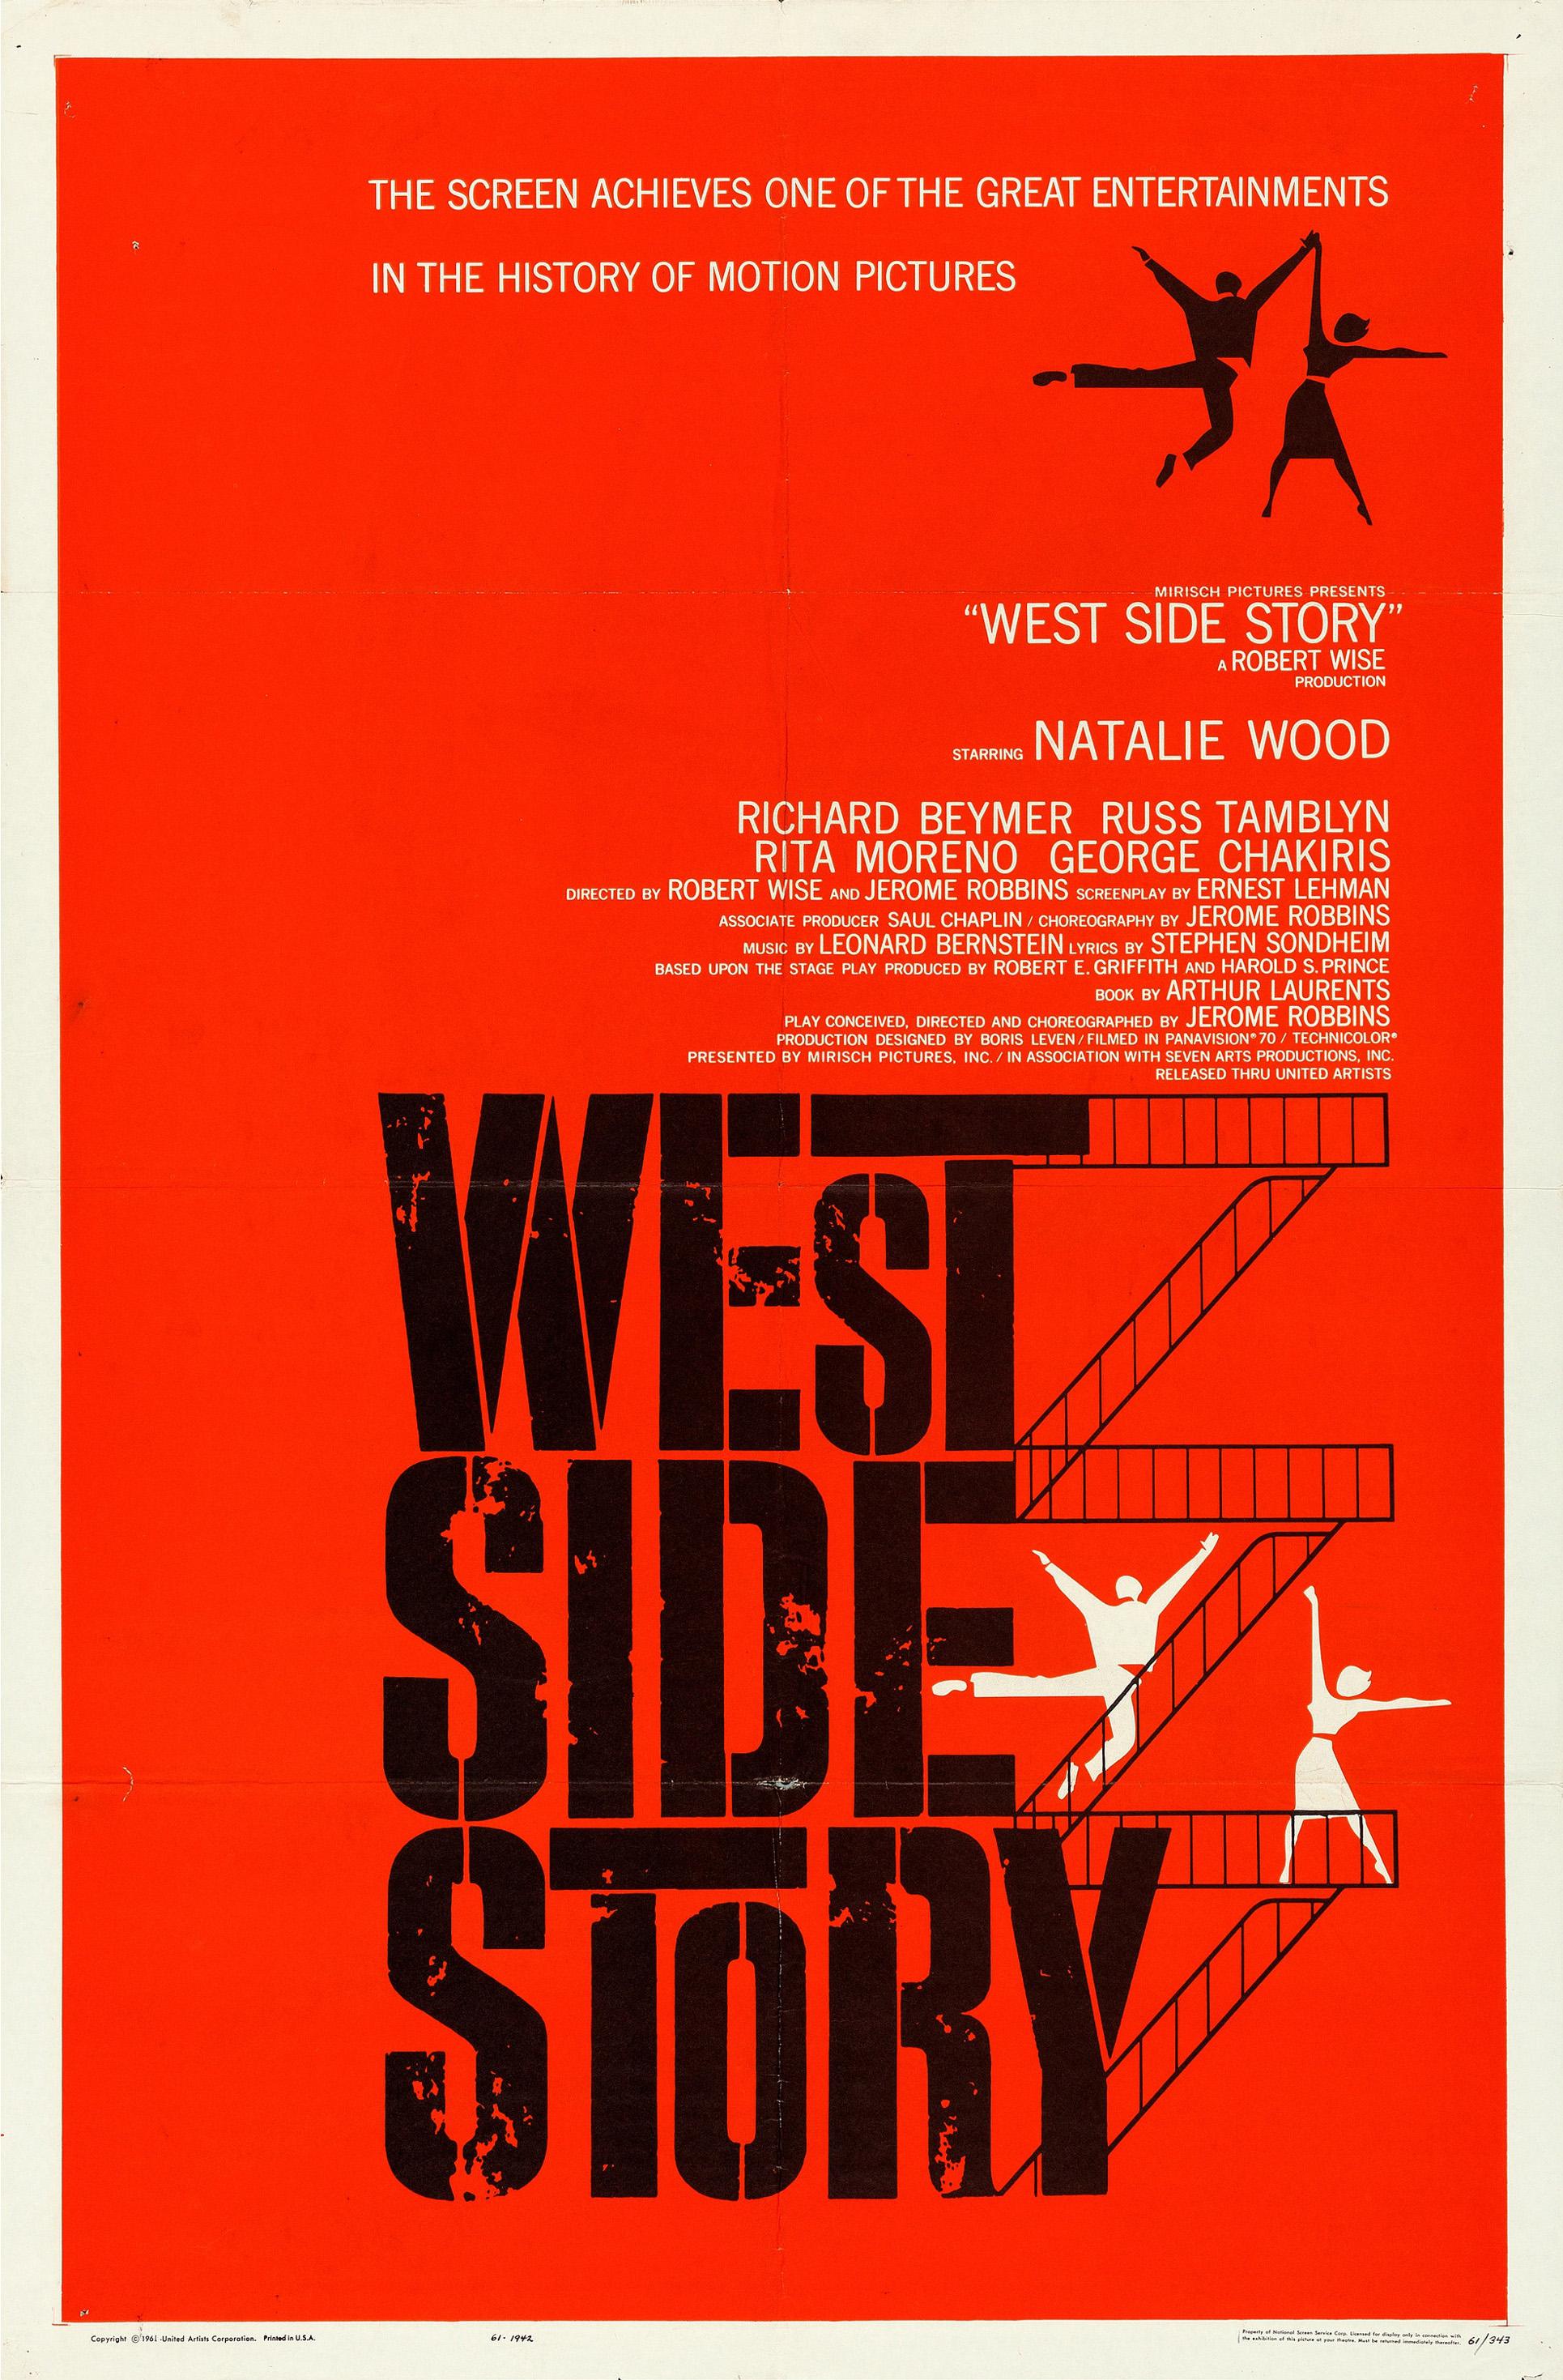 West_Side_Story_1961_film_poster.jpg